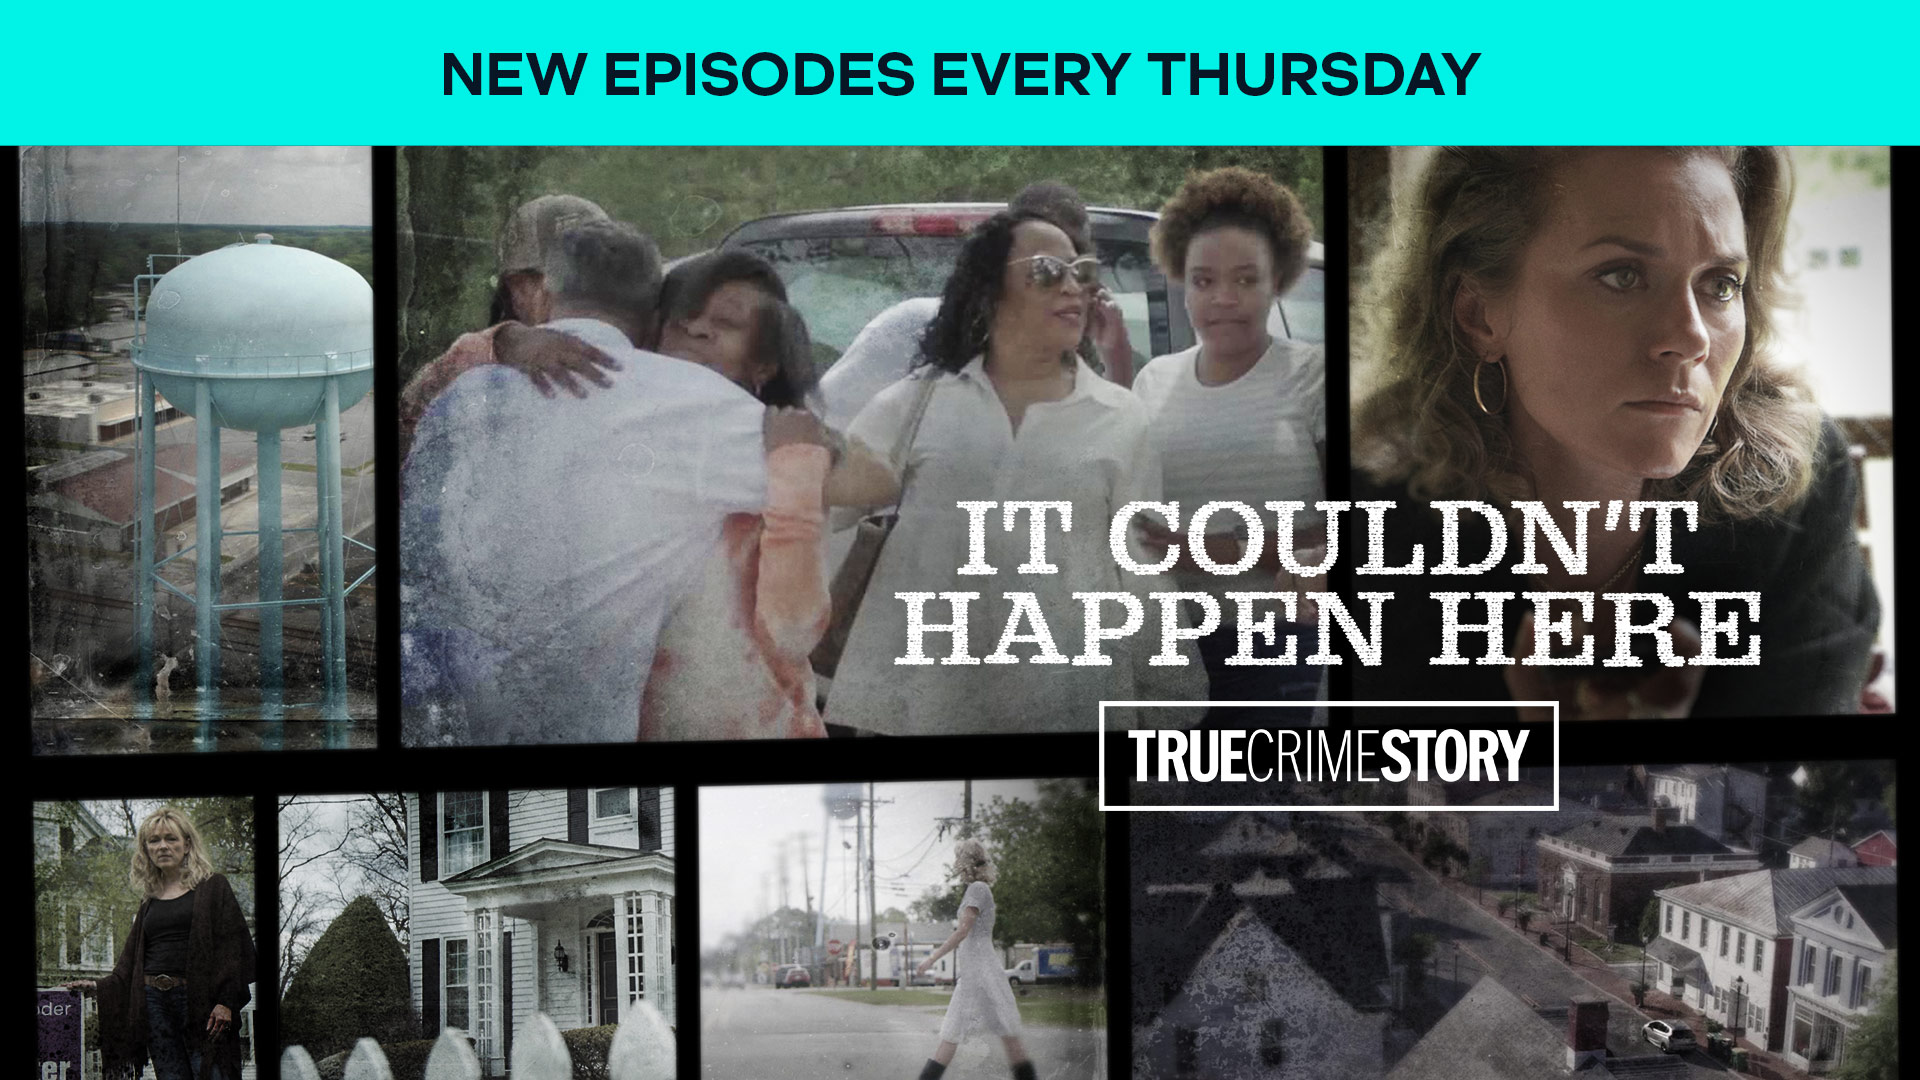 True Crime Story: It Couldn't Happen Here, Season 1